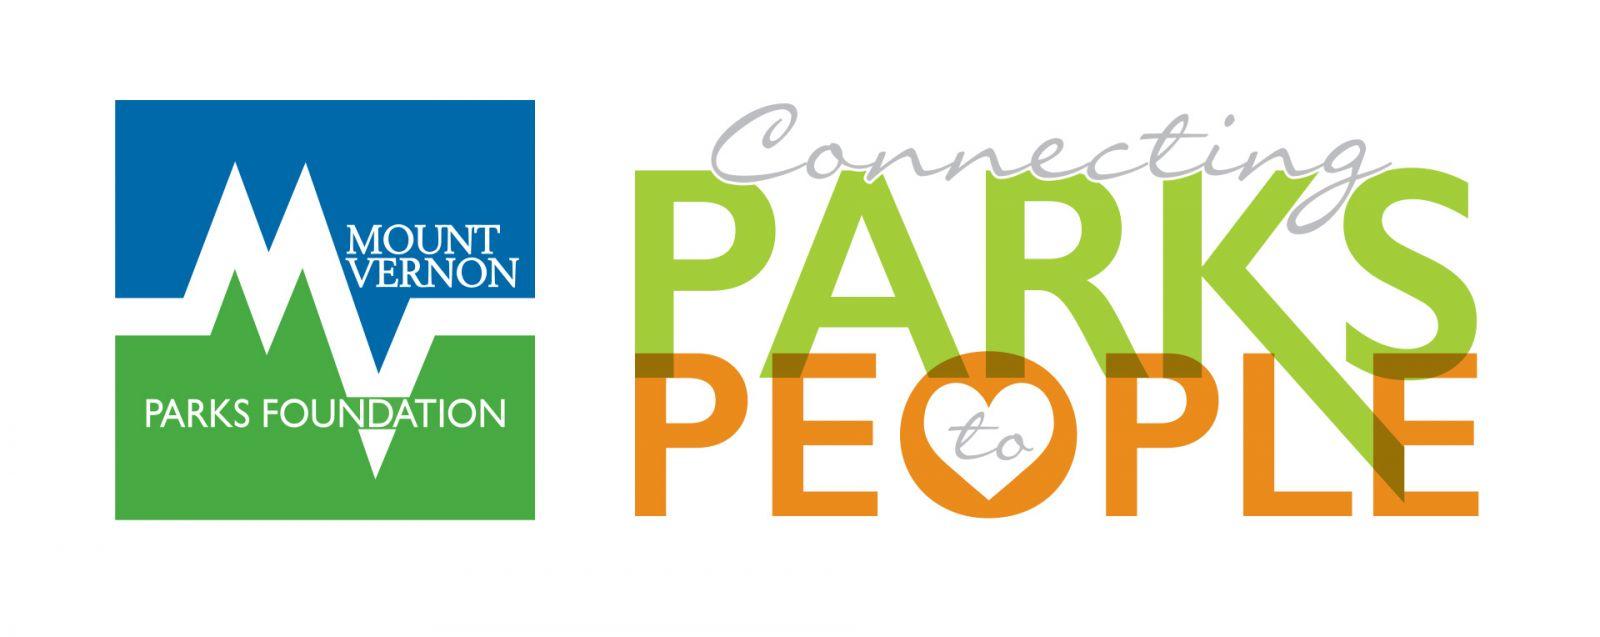 Mount Vernon Parks Foundation logo